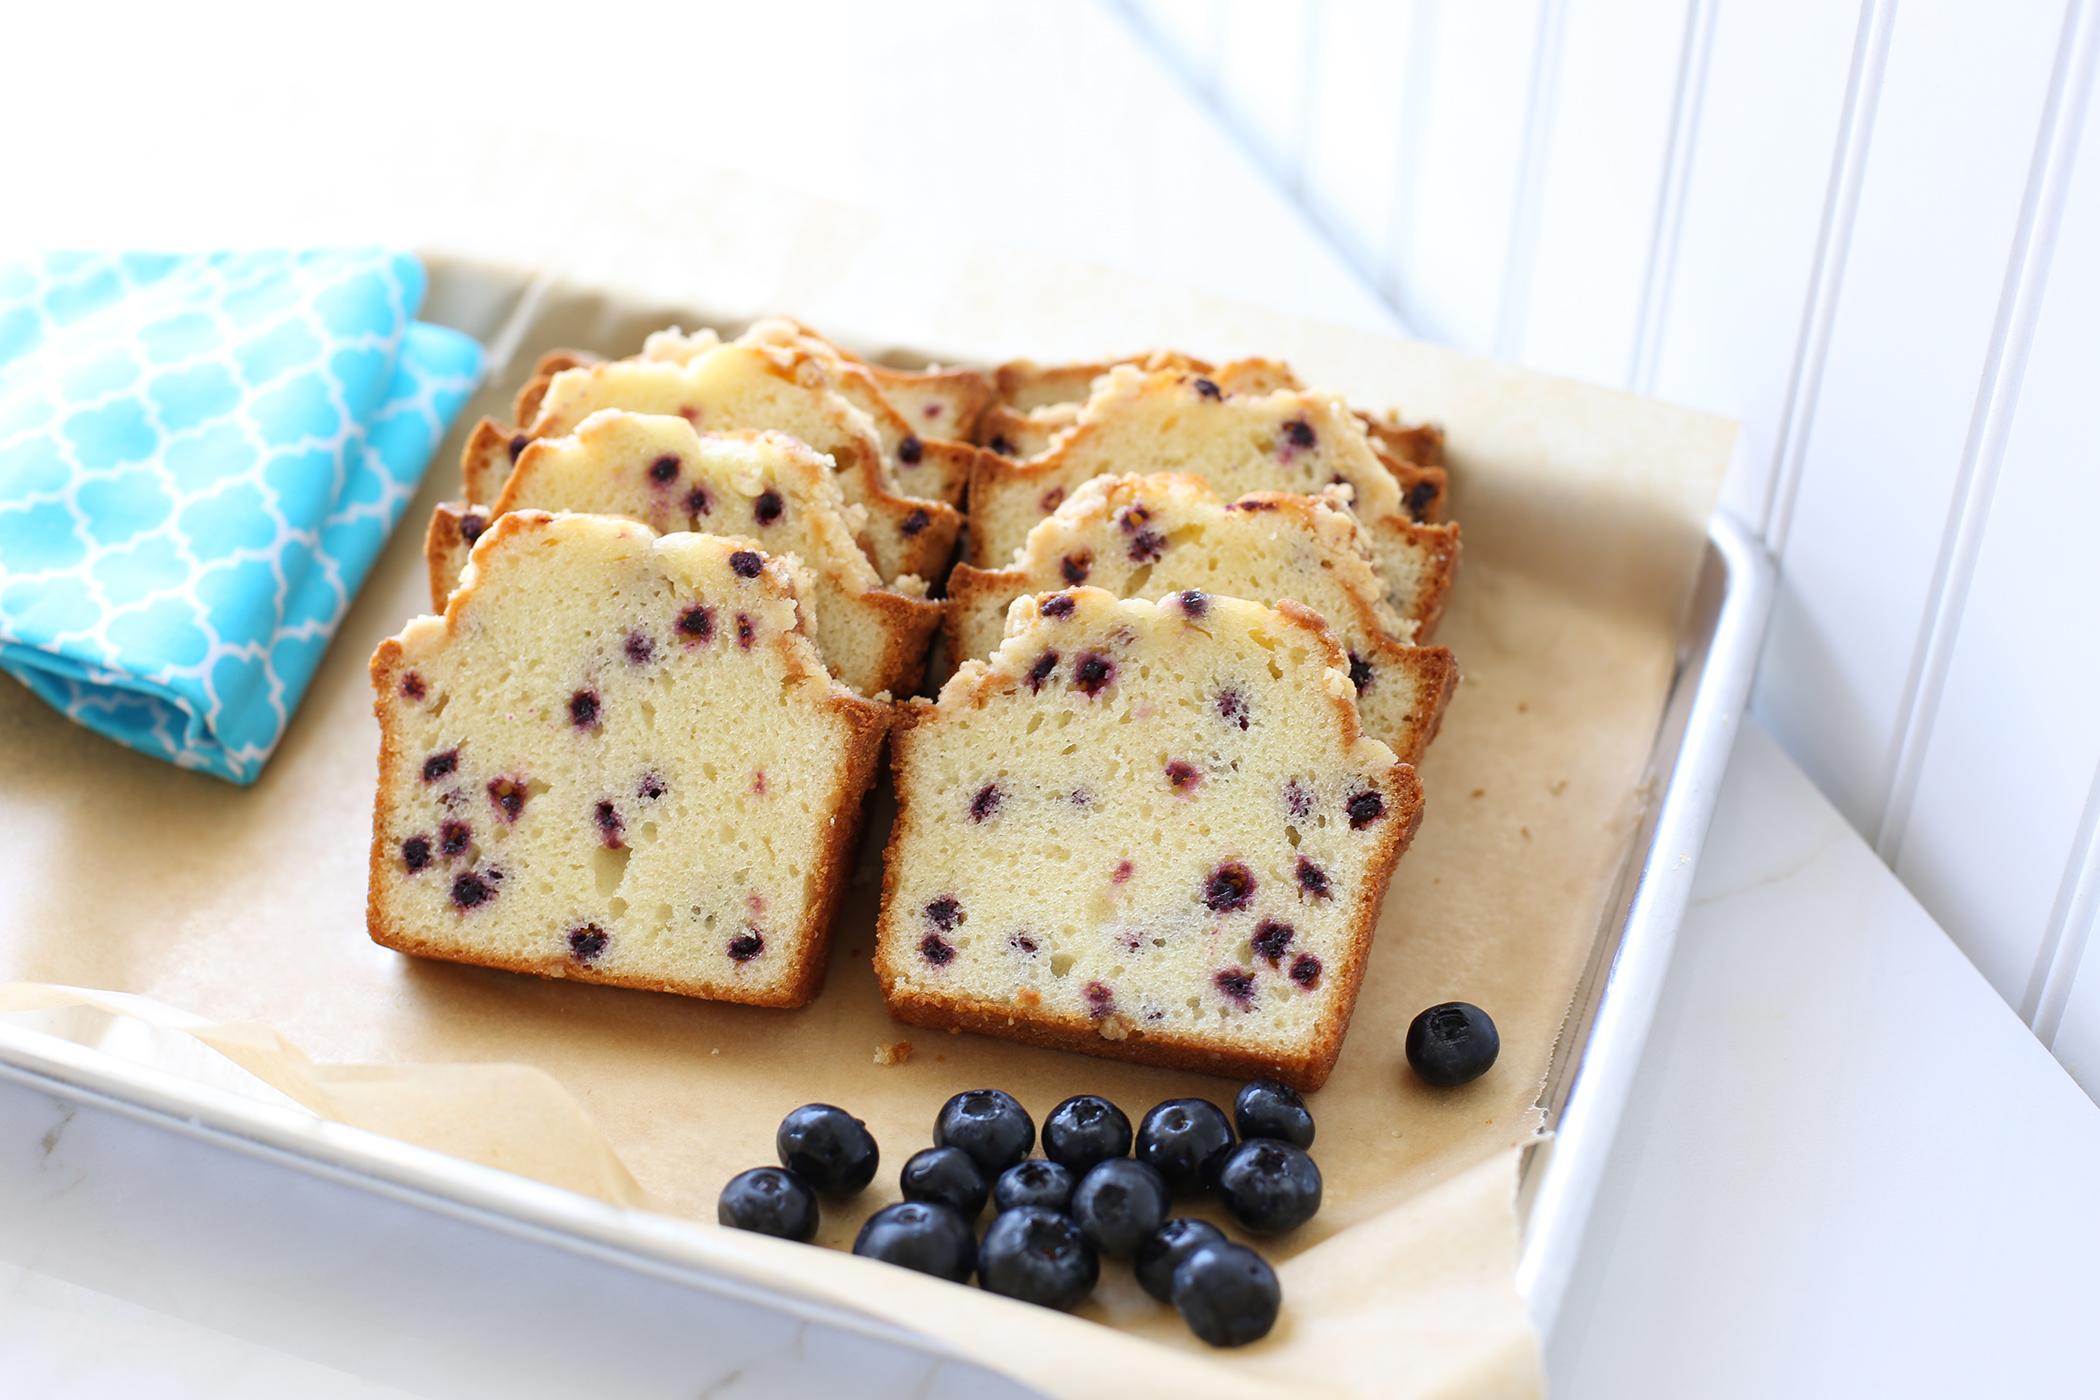 Mrs. Wonderful's Cakes™ - Blueberry Sliced Loaf Cake